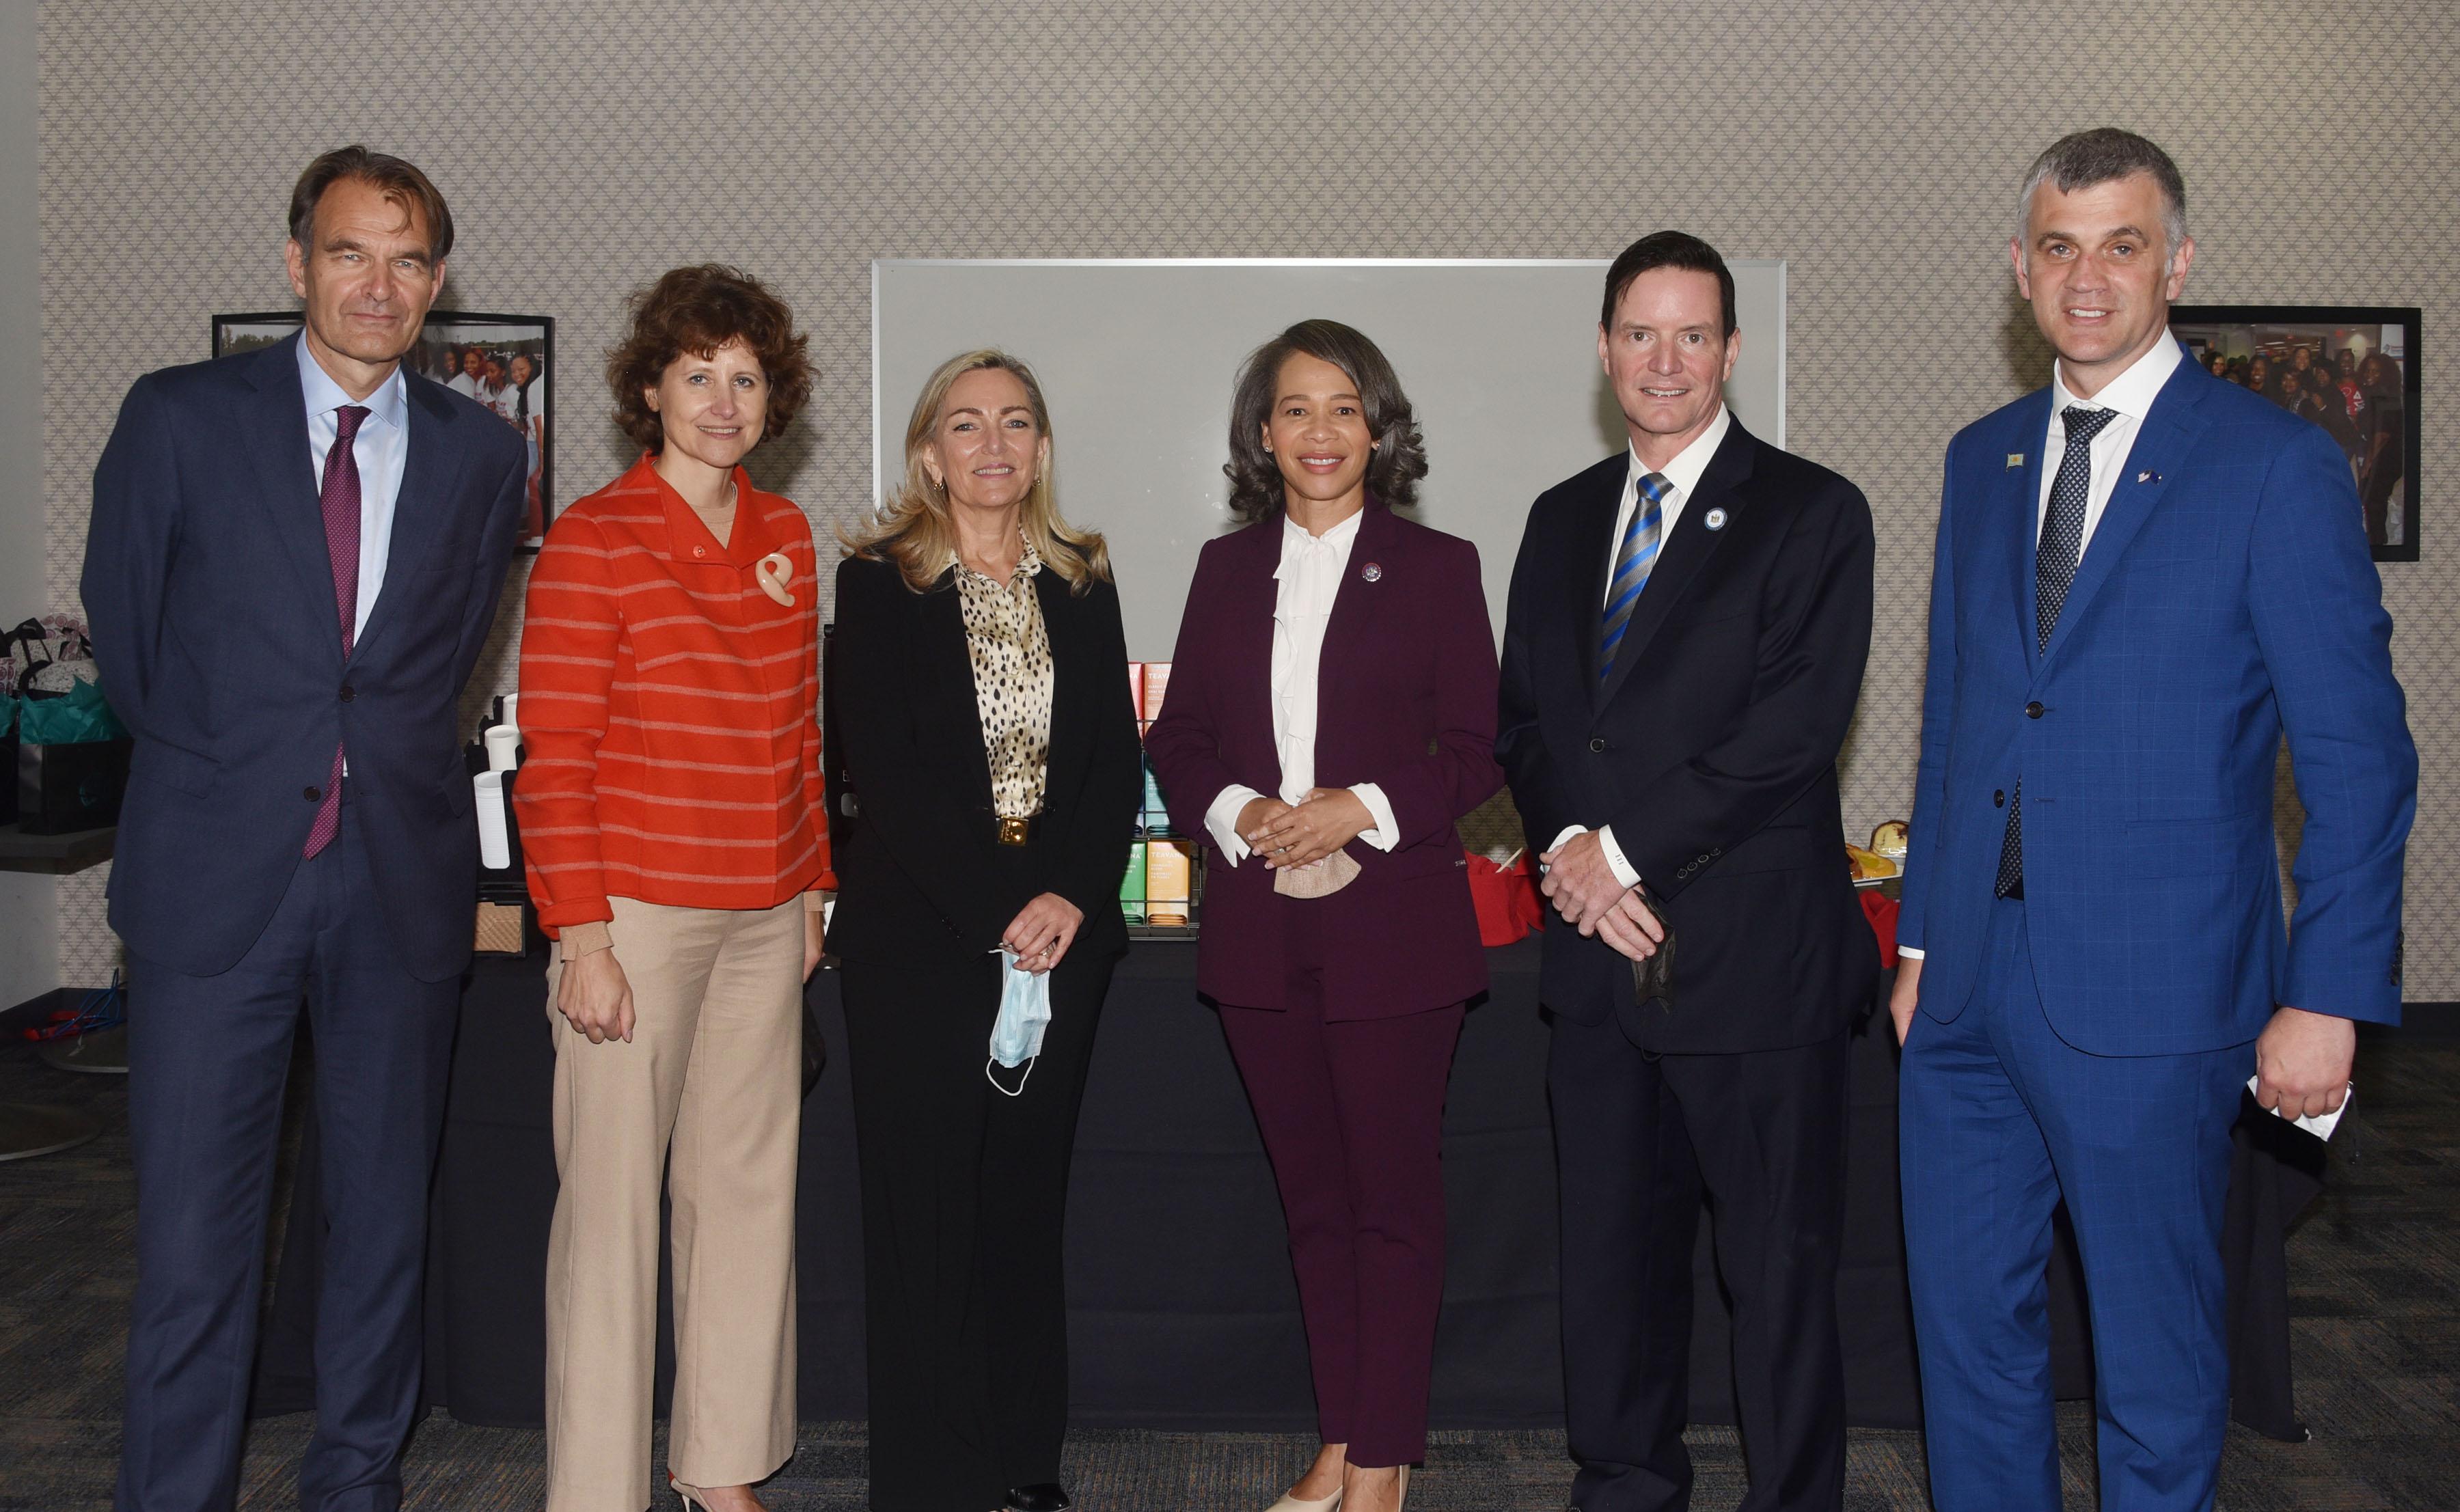 European Union Ambassadors visit Del State for panel discussion